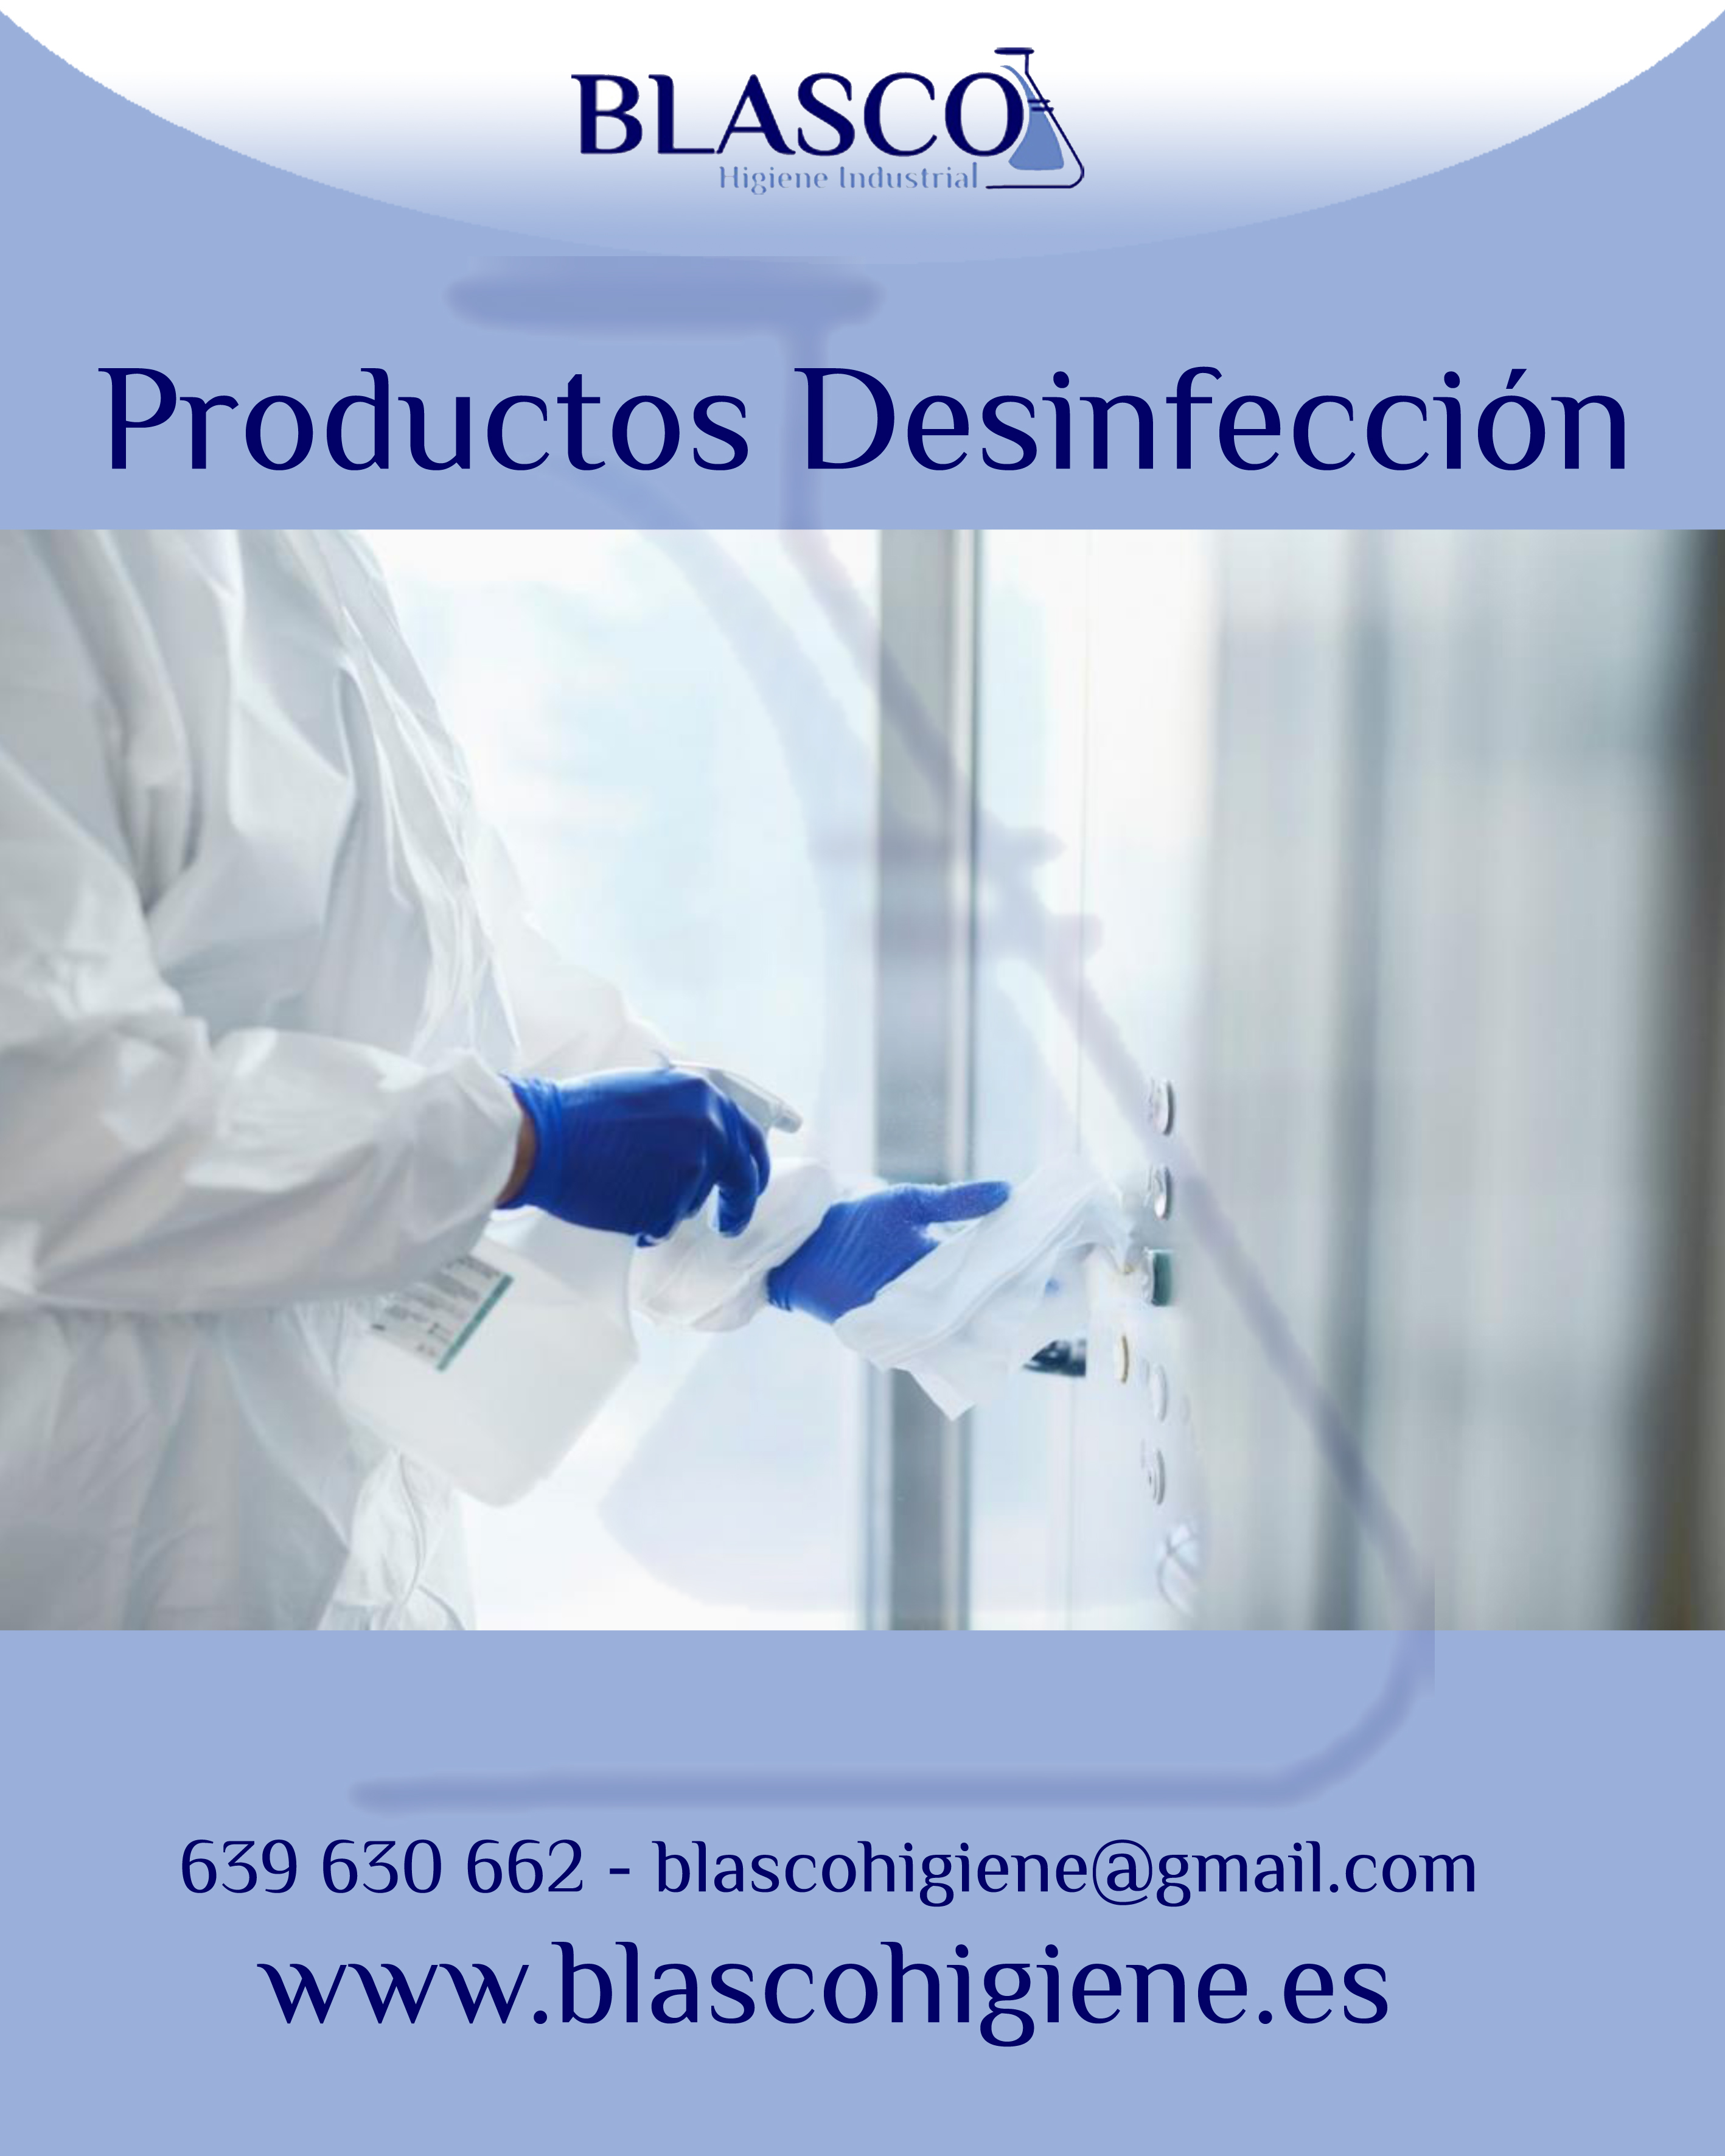 Blasco Higiene - Productos desinfección virucidas